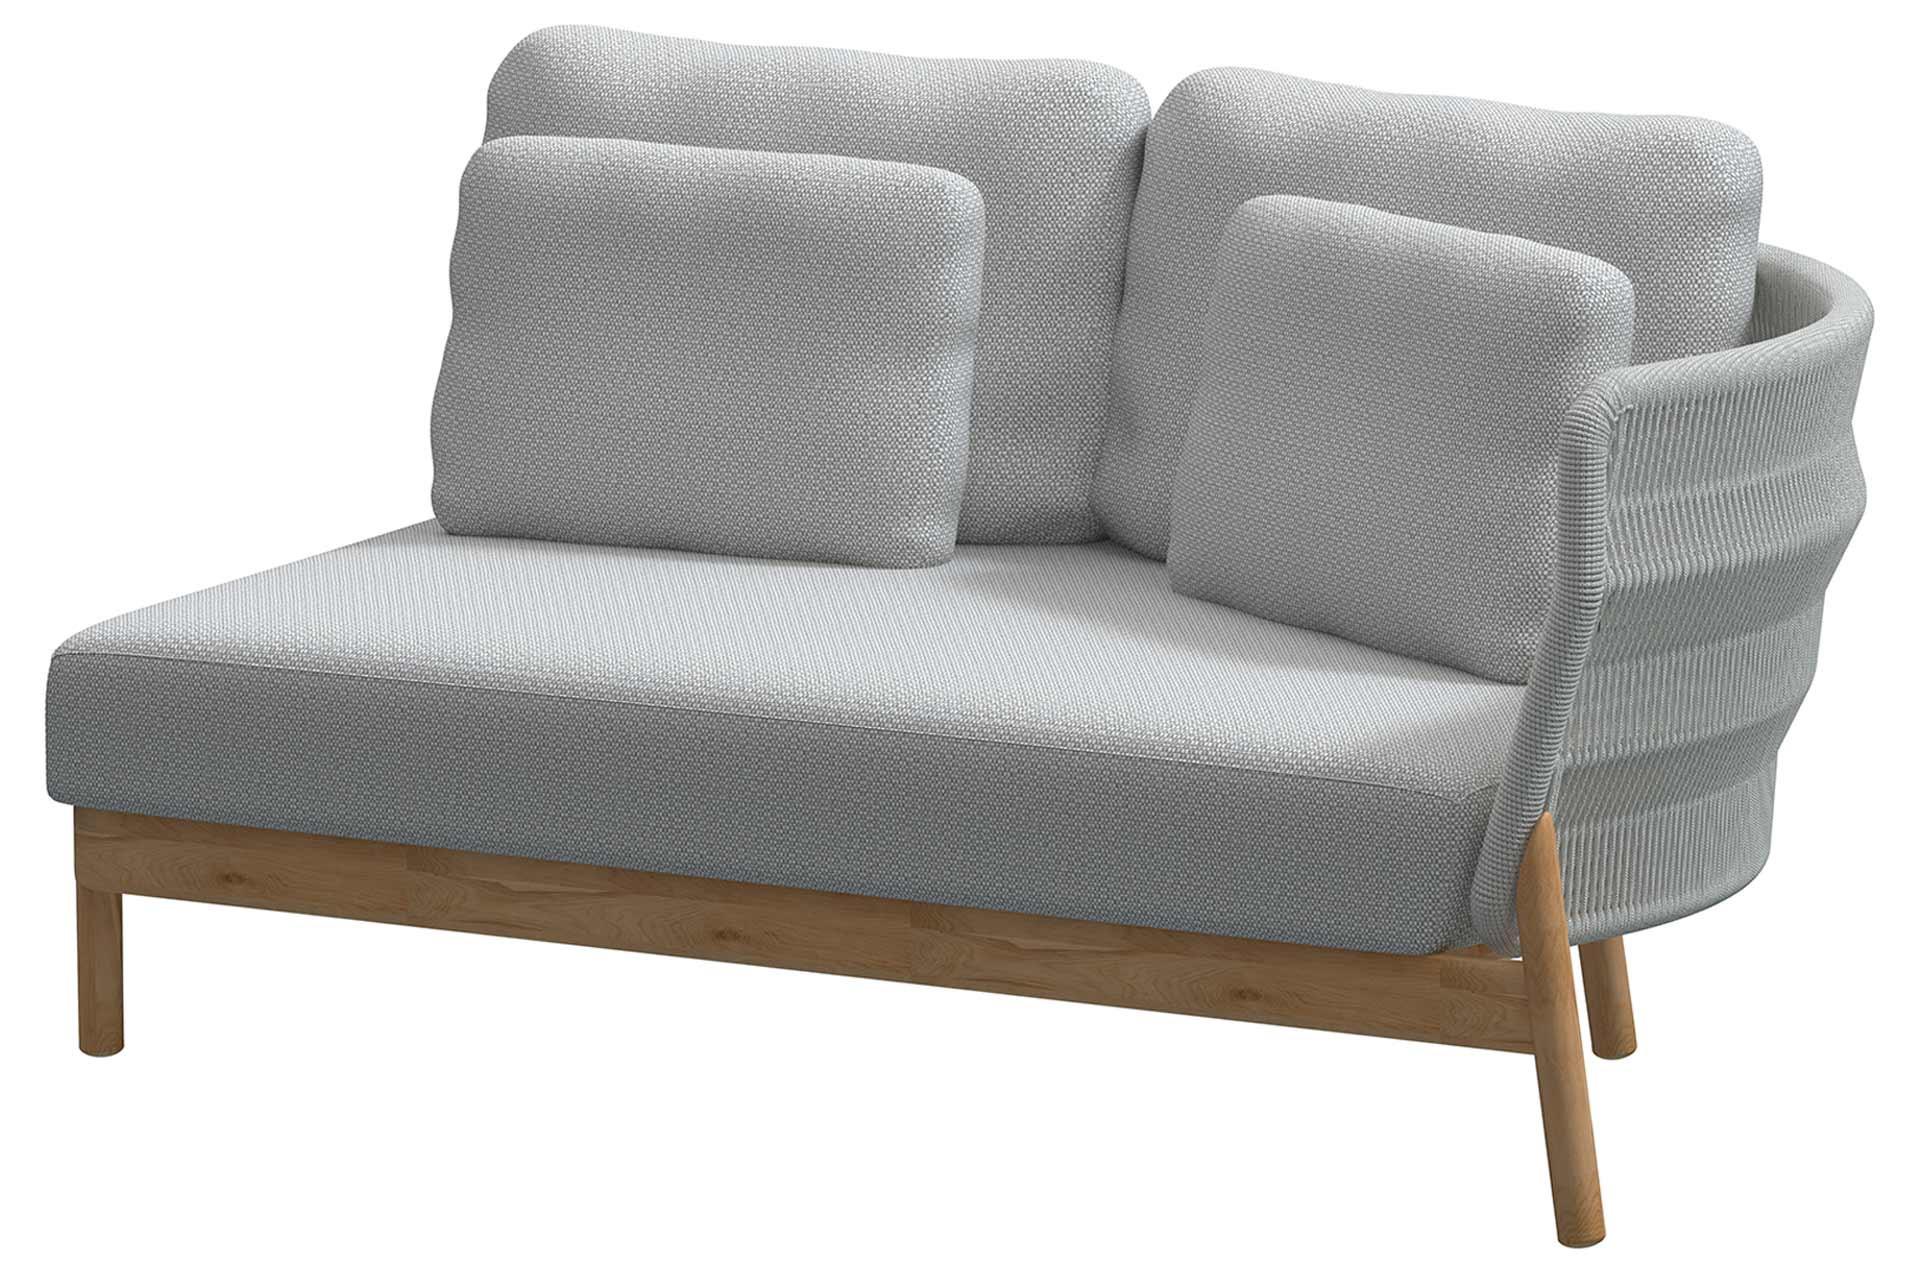 Avalon teak modular 2 seater bench left arm Frozen with 5 cushions